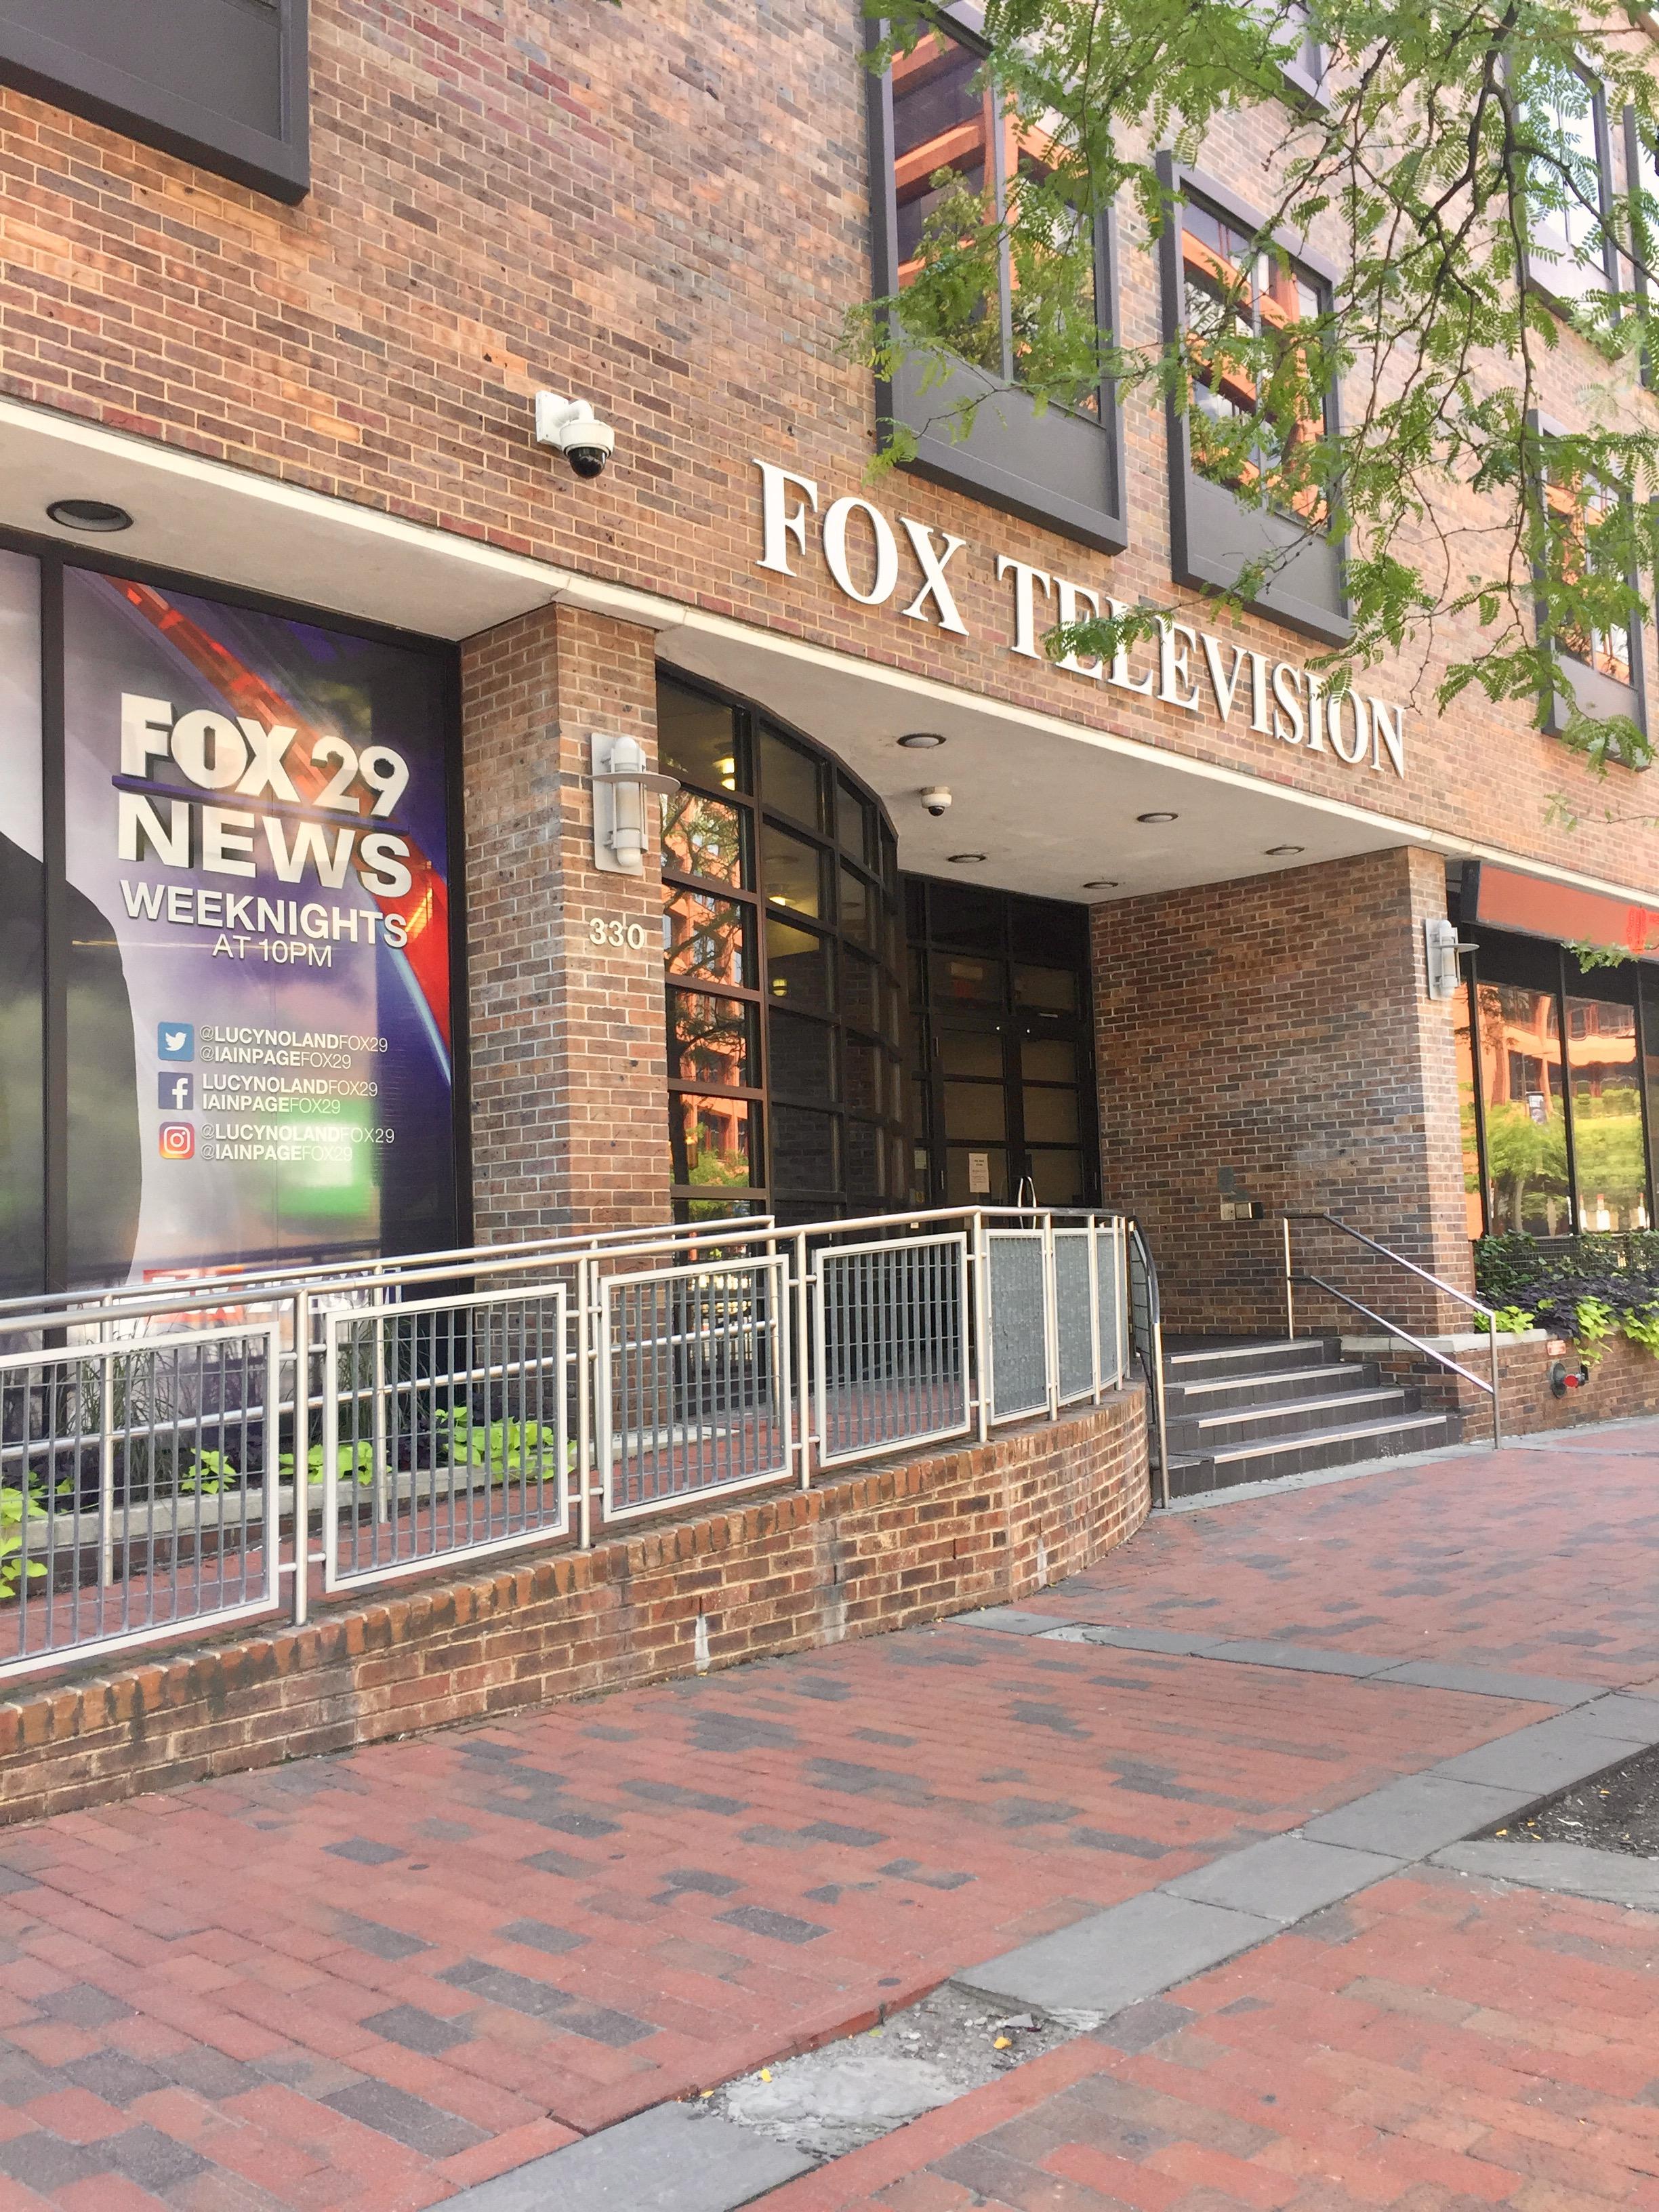 Fox 29 Television Studios.jpg